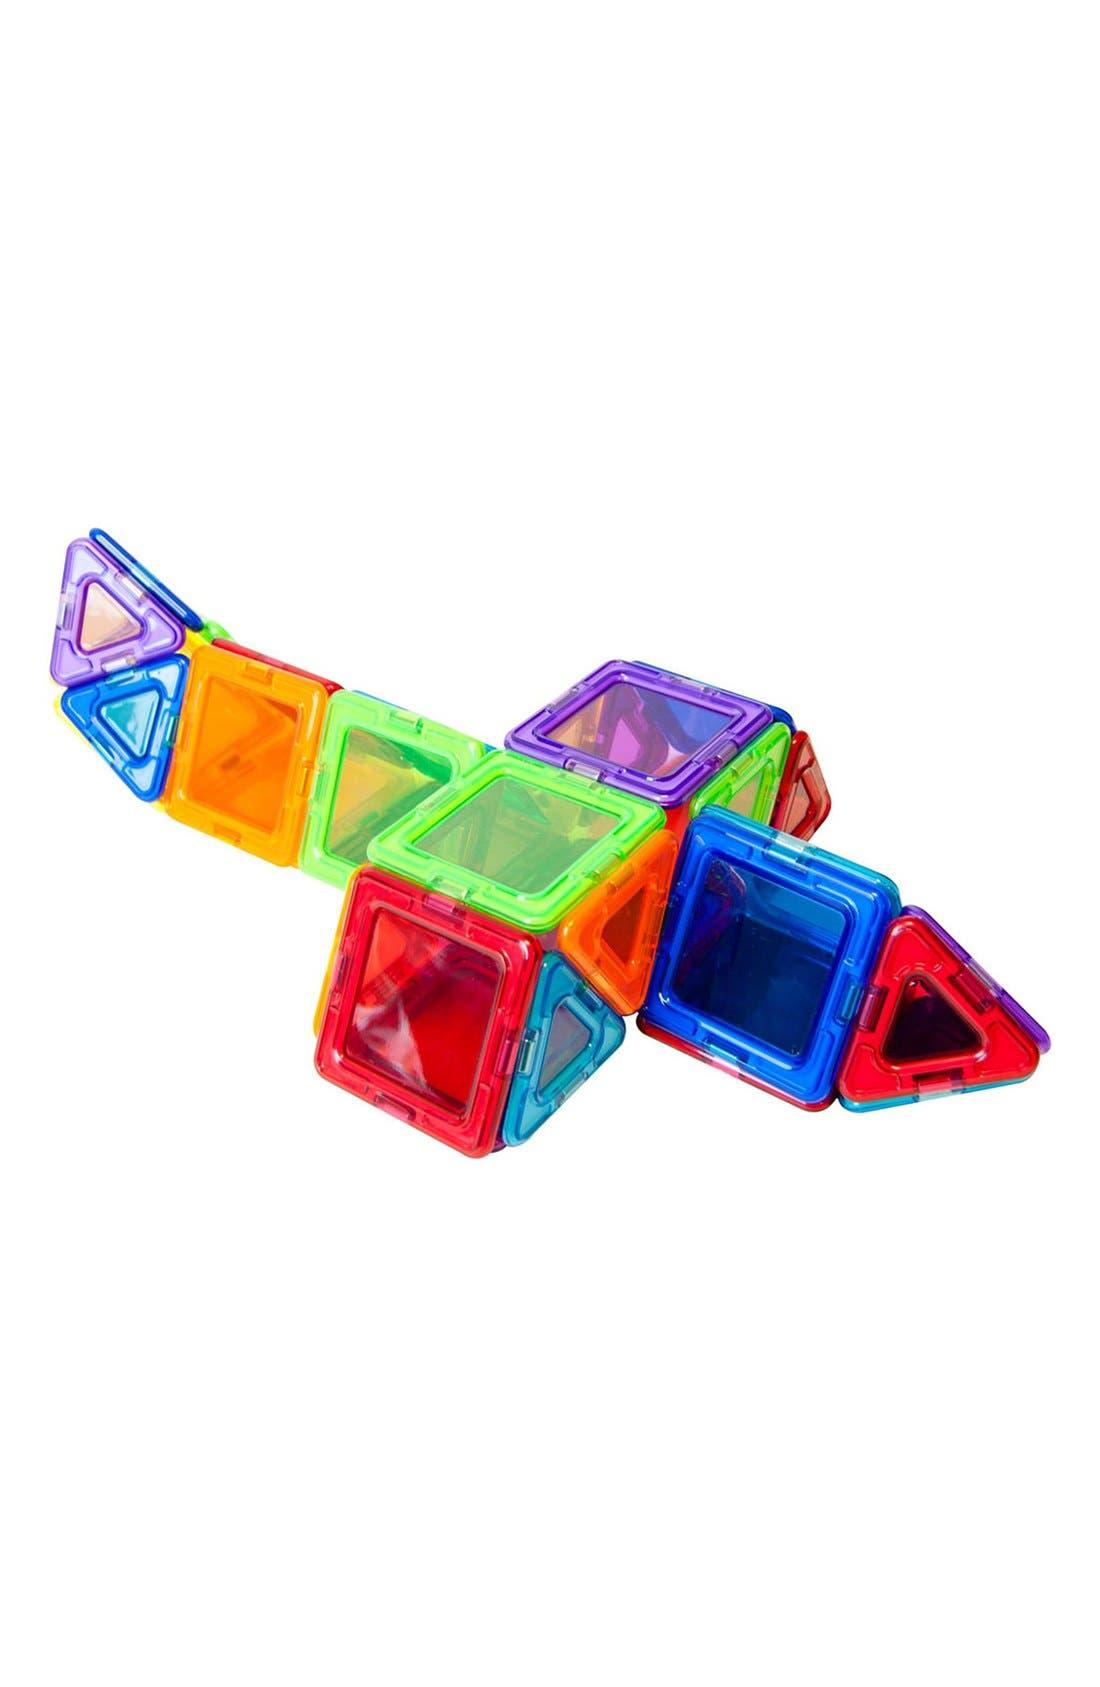 'Standard - Solids' Clear Magnetic 3D Construction Set,                             Alternate thumbnail 6, color,                             600